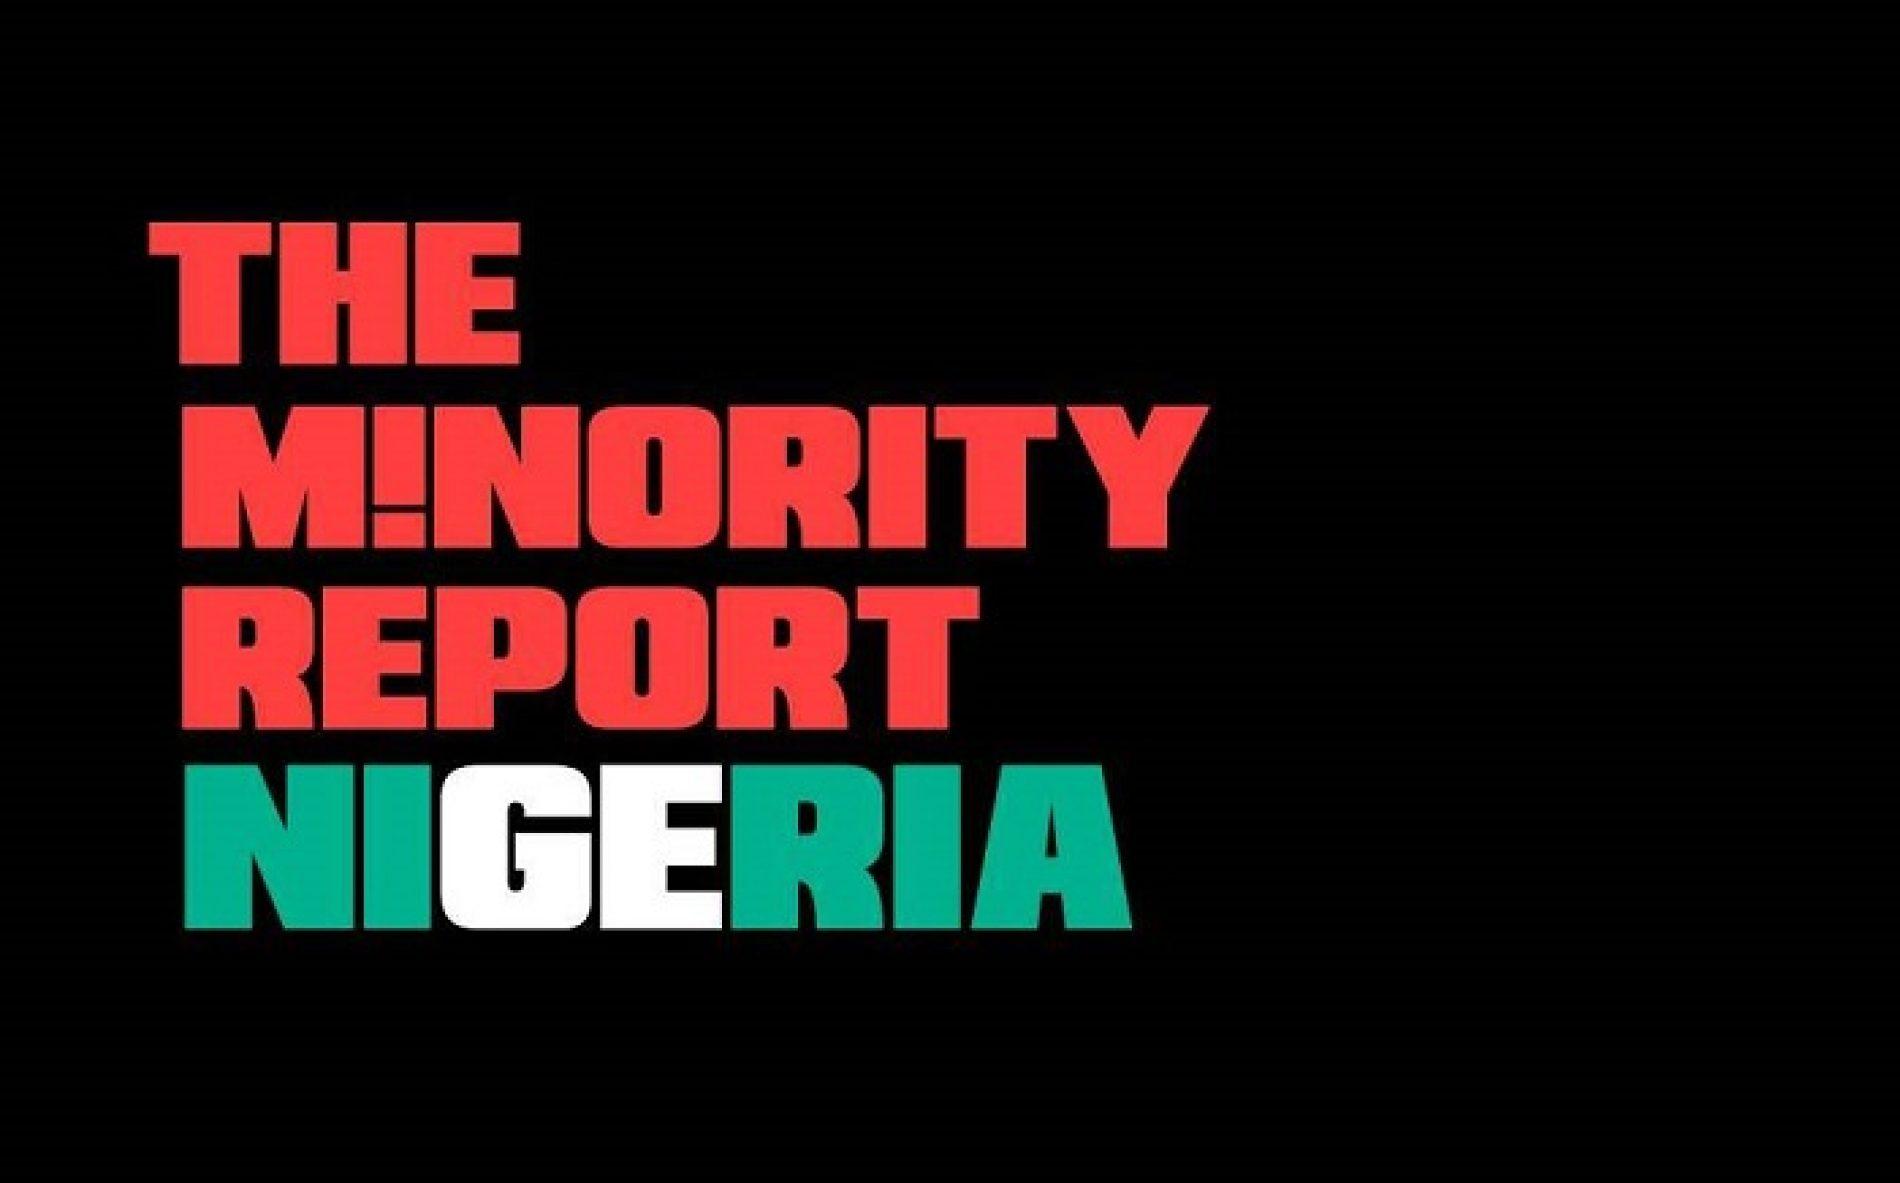 #NaGayDeyReign: The Minority Report on 2020's Gay Agenda